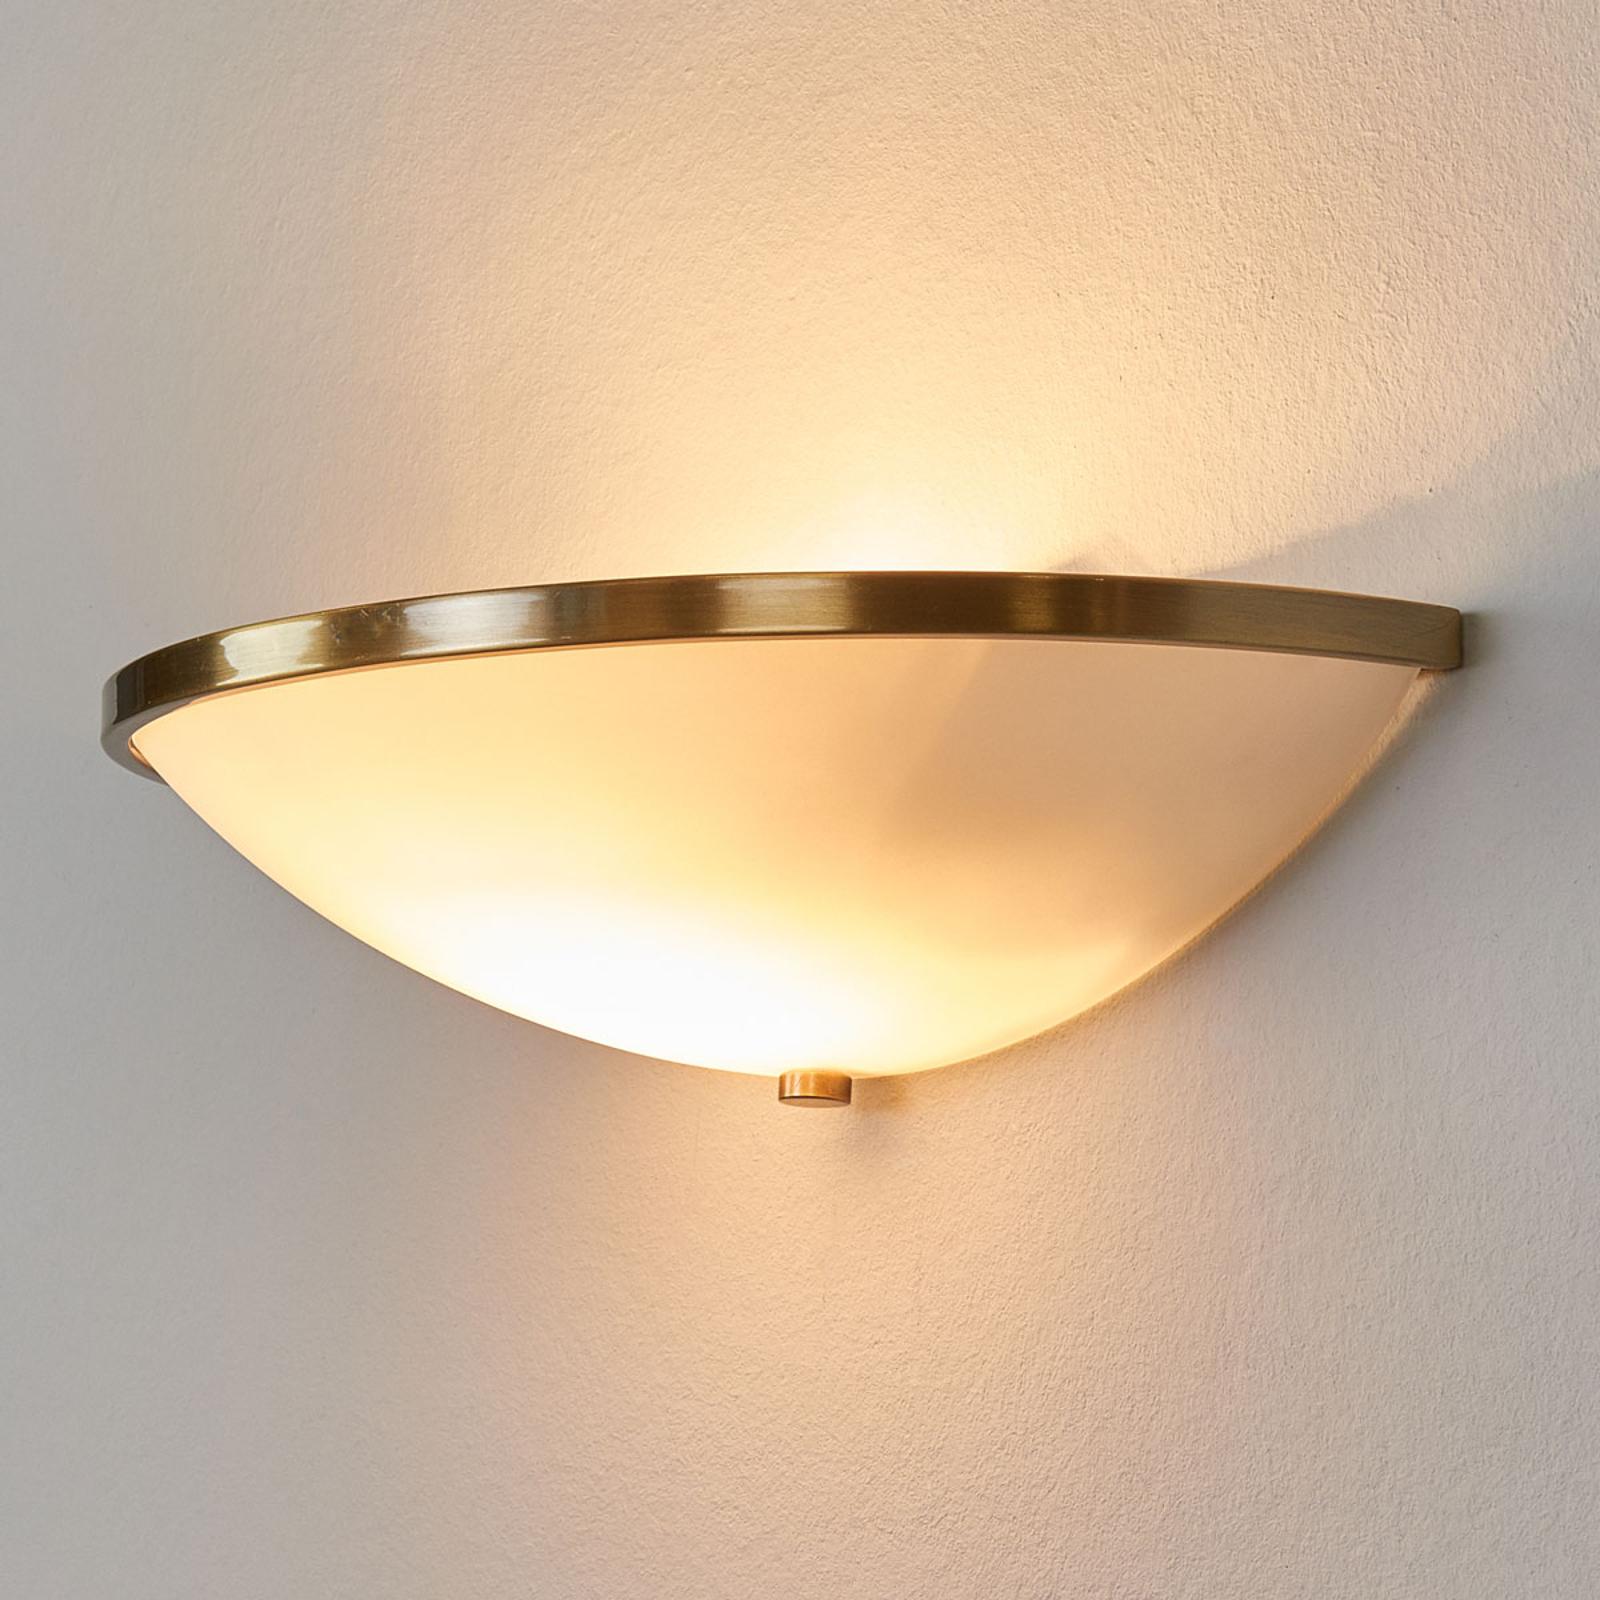 Stijlvolle wandlamp TALYA in oud-messingdecor